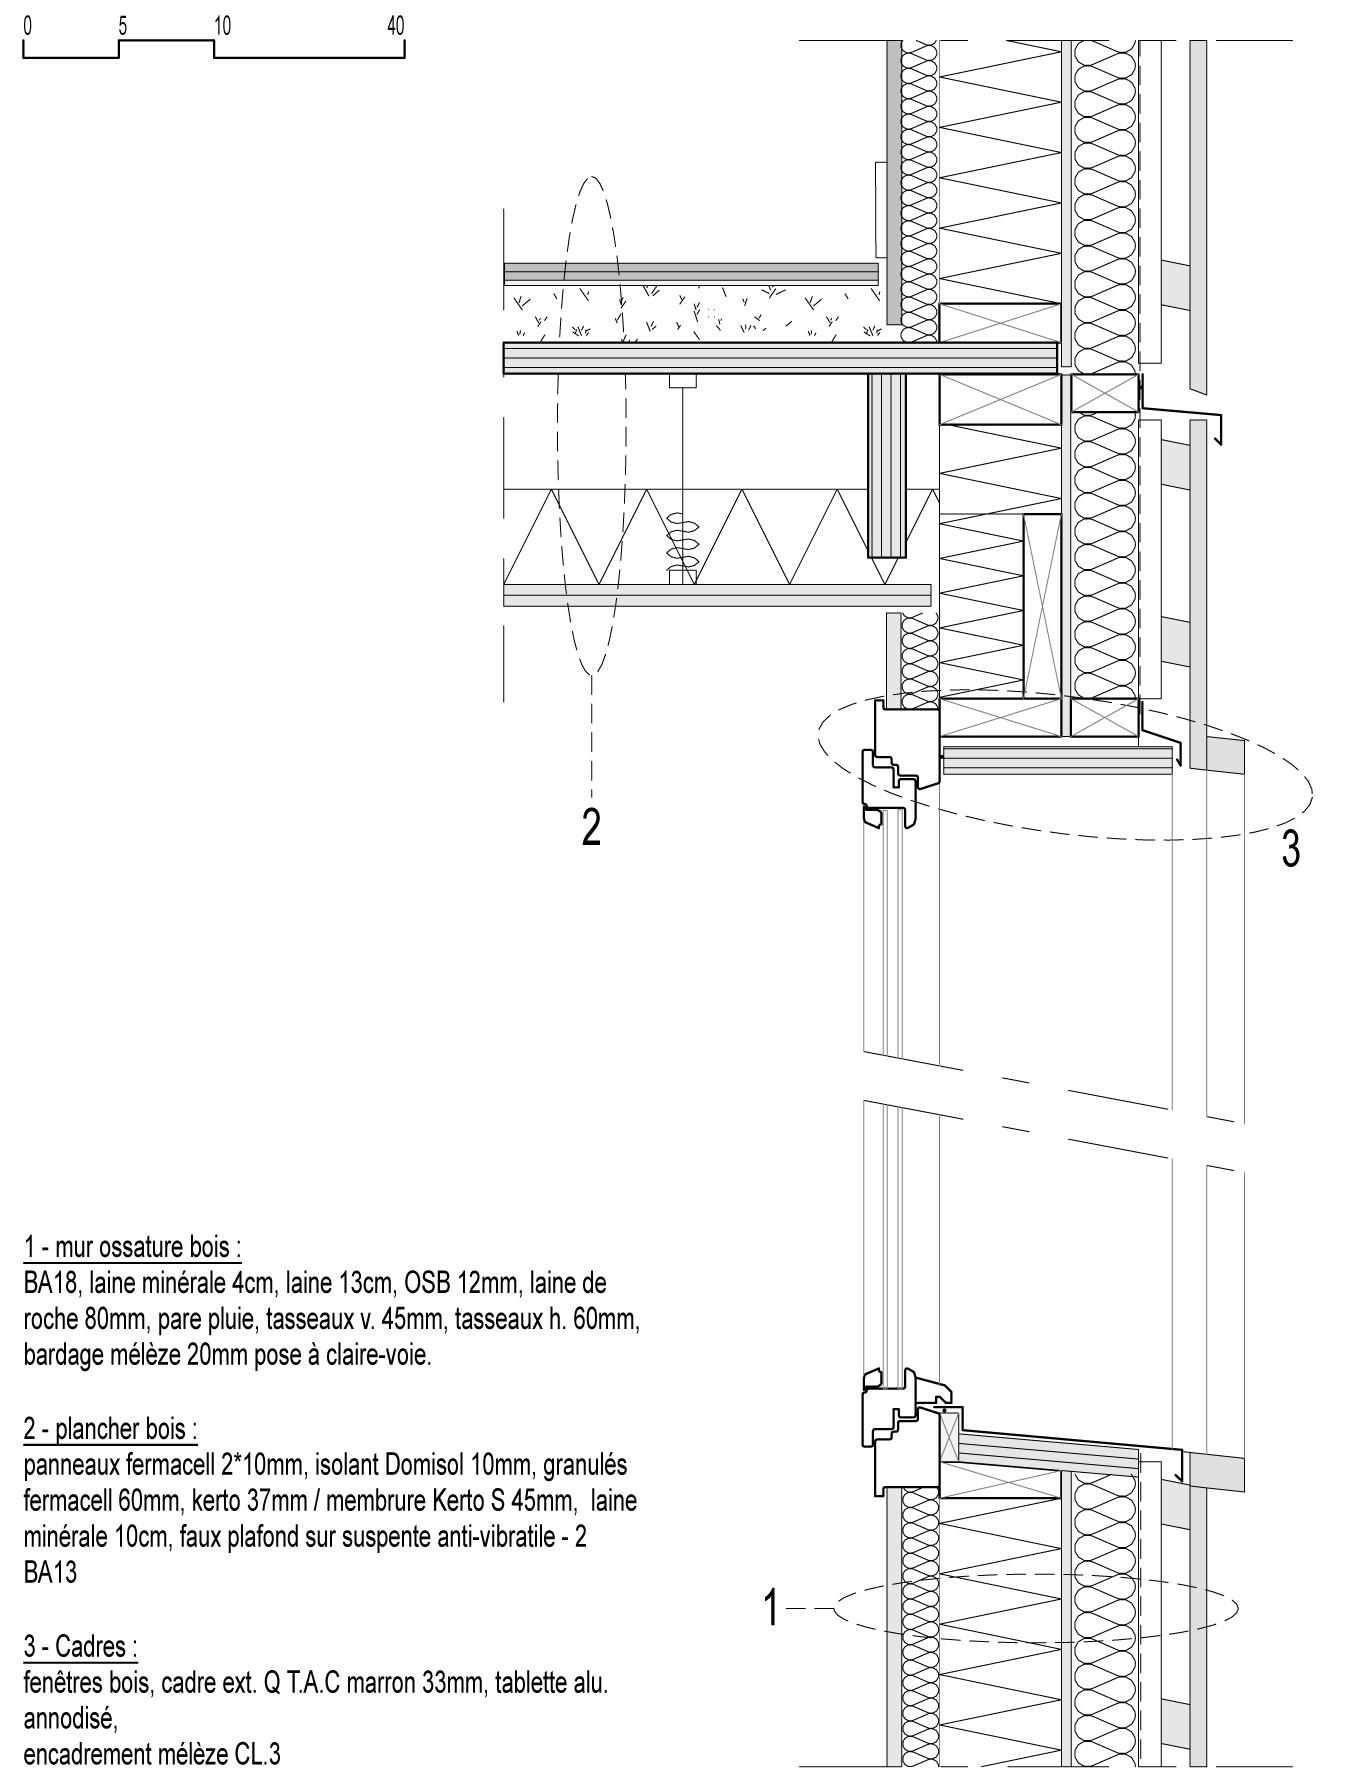 Gallery Of Tete In L Air Koz Architectes 19